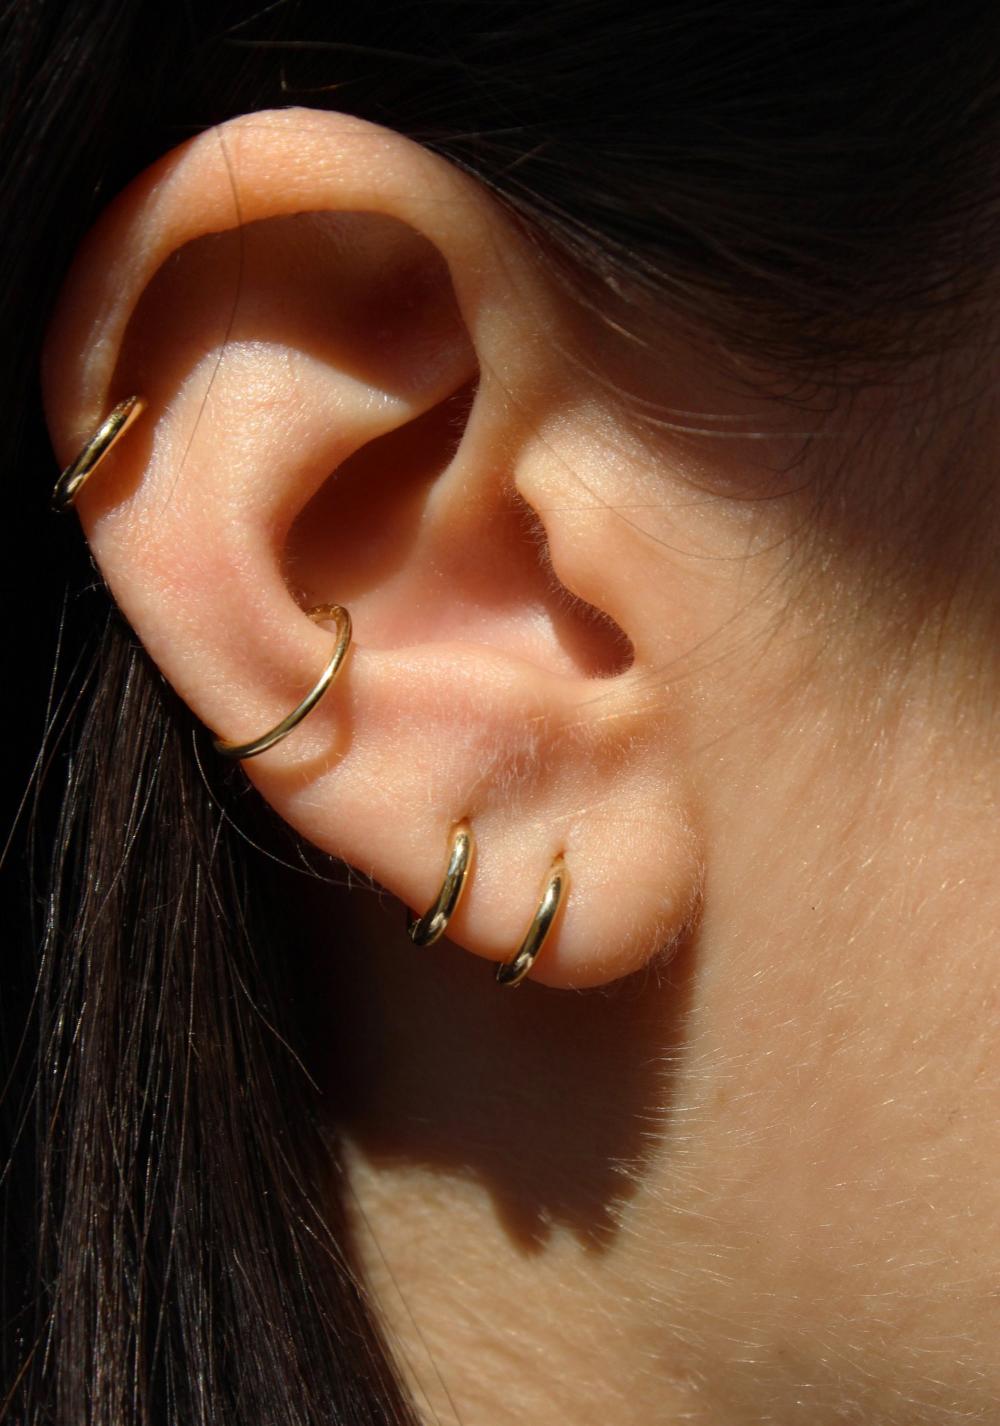 Simple Stud, Piercing Earring Helix Conch 14K Solid Gold Bar Birthstone Stud Lobe Tragus Cartilage Minimalist Earring